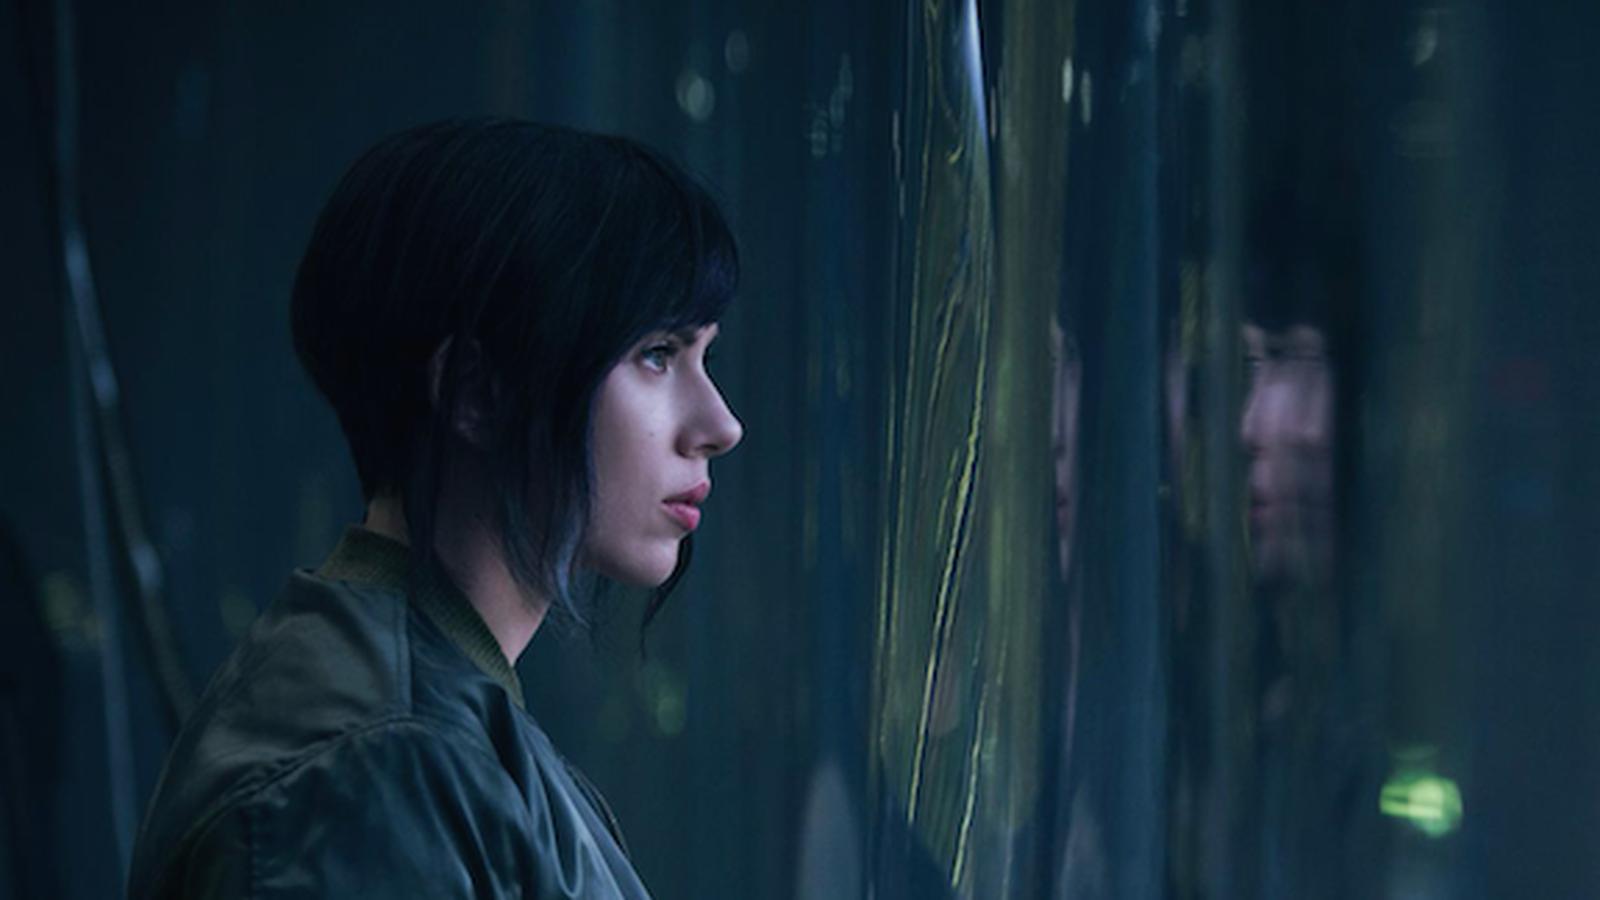 Scarlett Johansson Goes to Battle in Ghost in the Shell